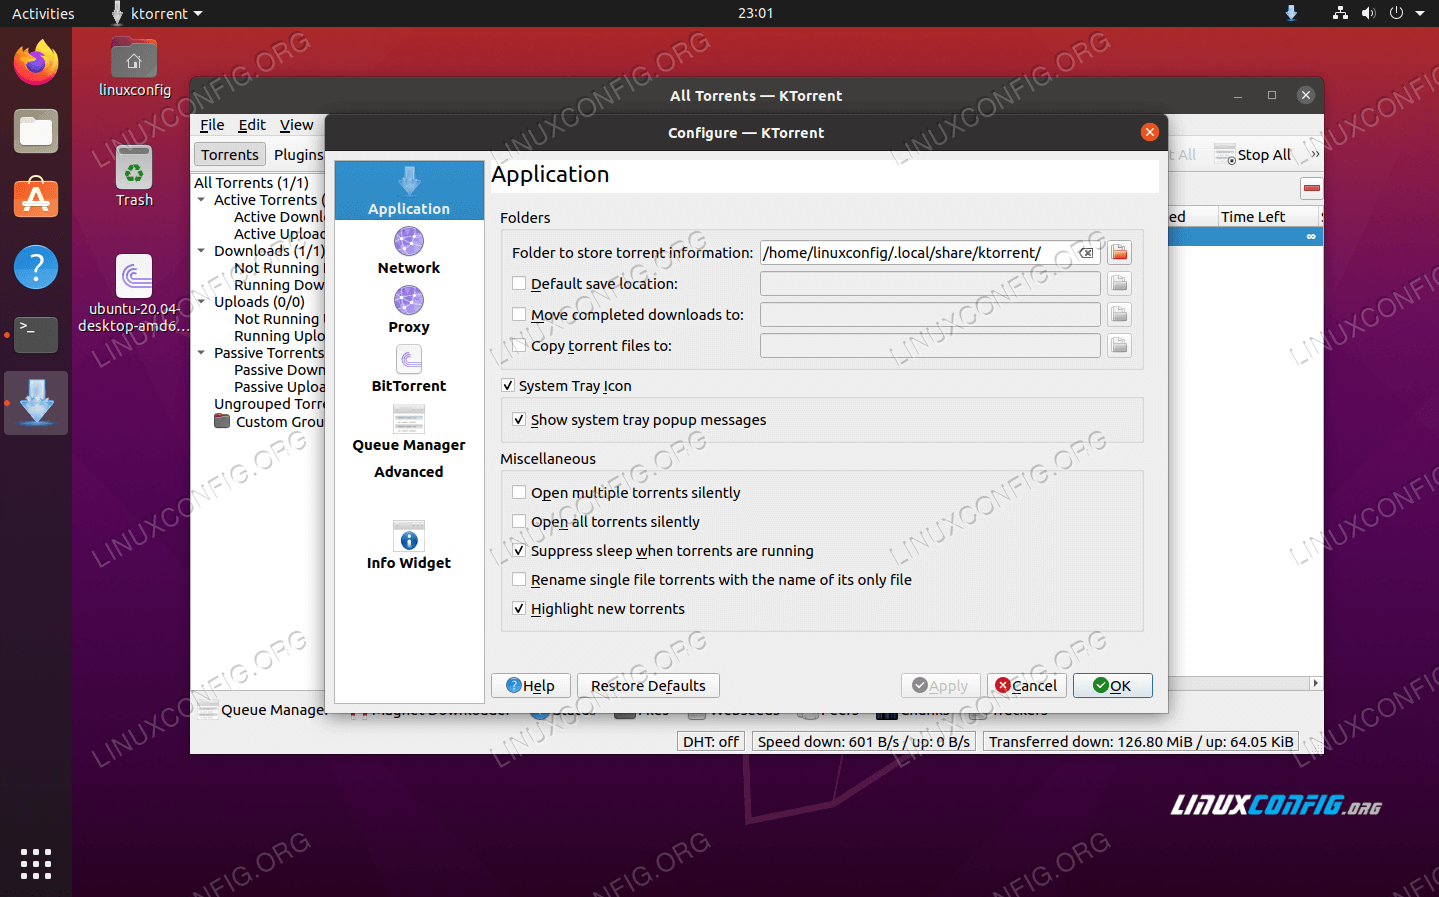 Options menu inside KTorrent